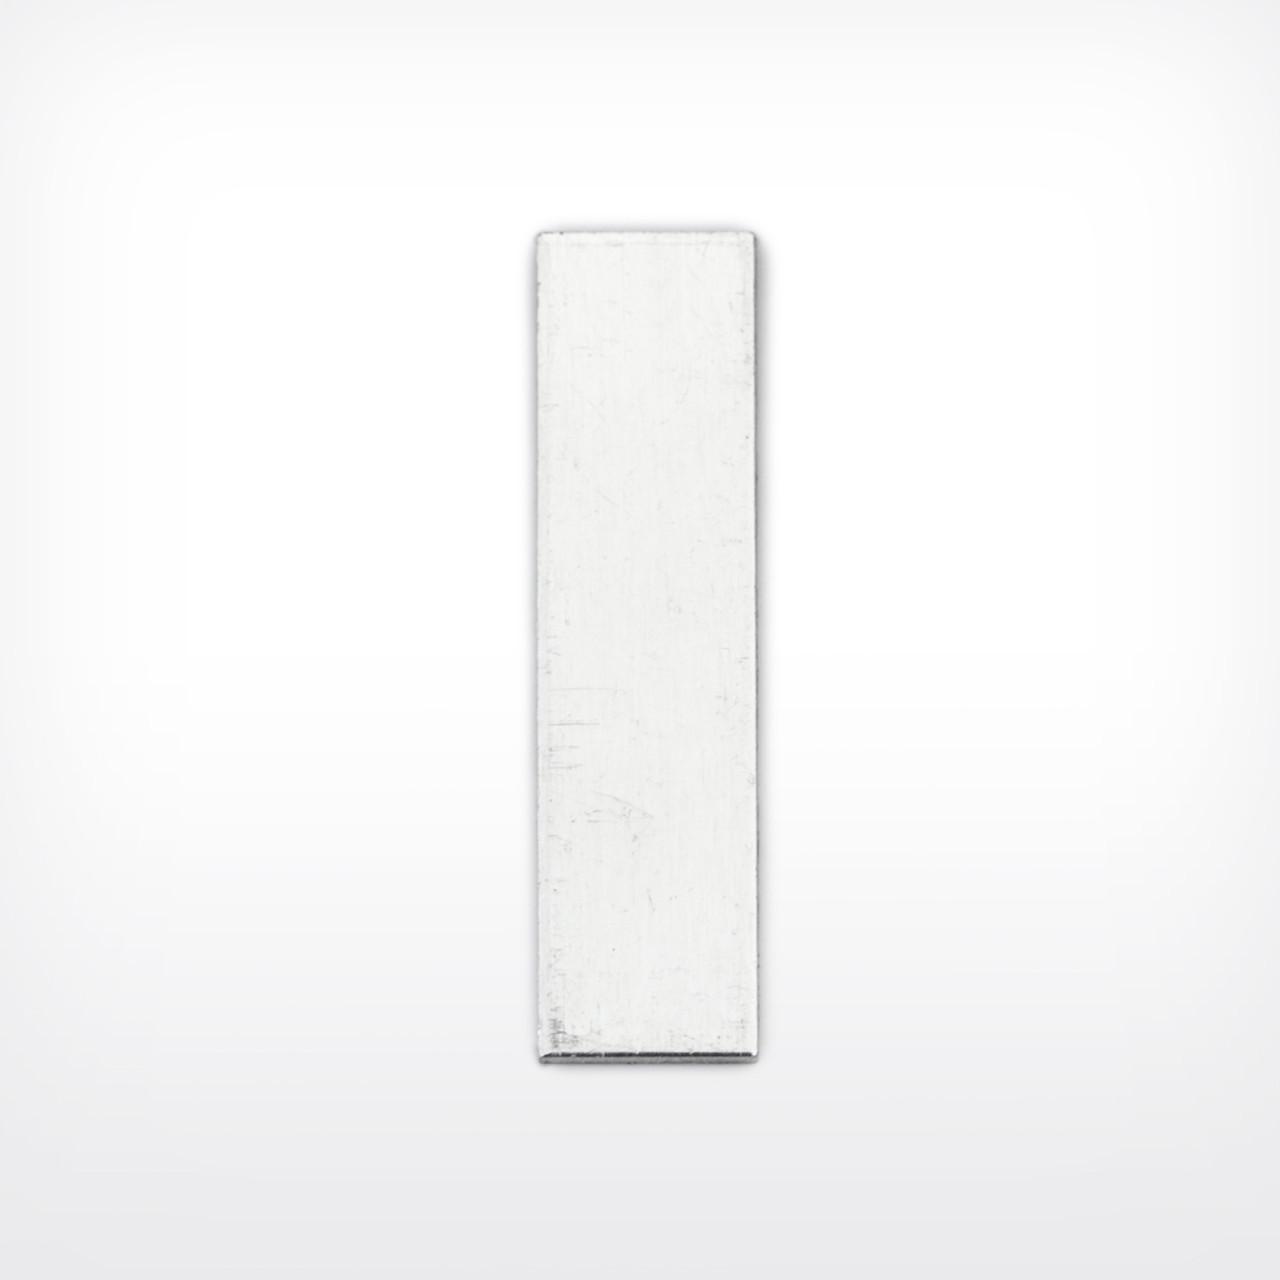 Aluminium Rectangle, 30x8mm - Pack of 10 (607-AL)